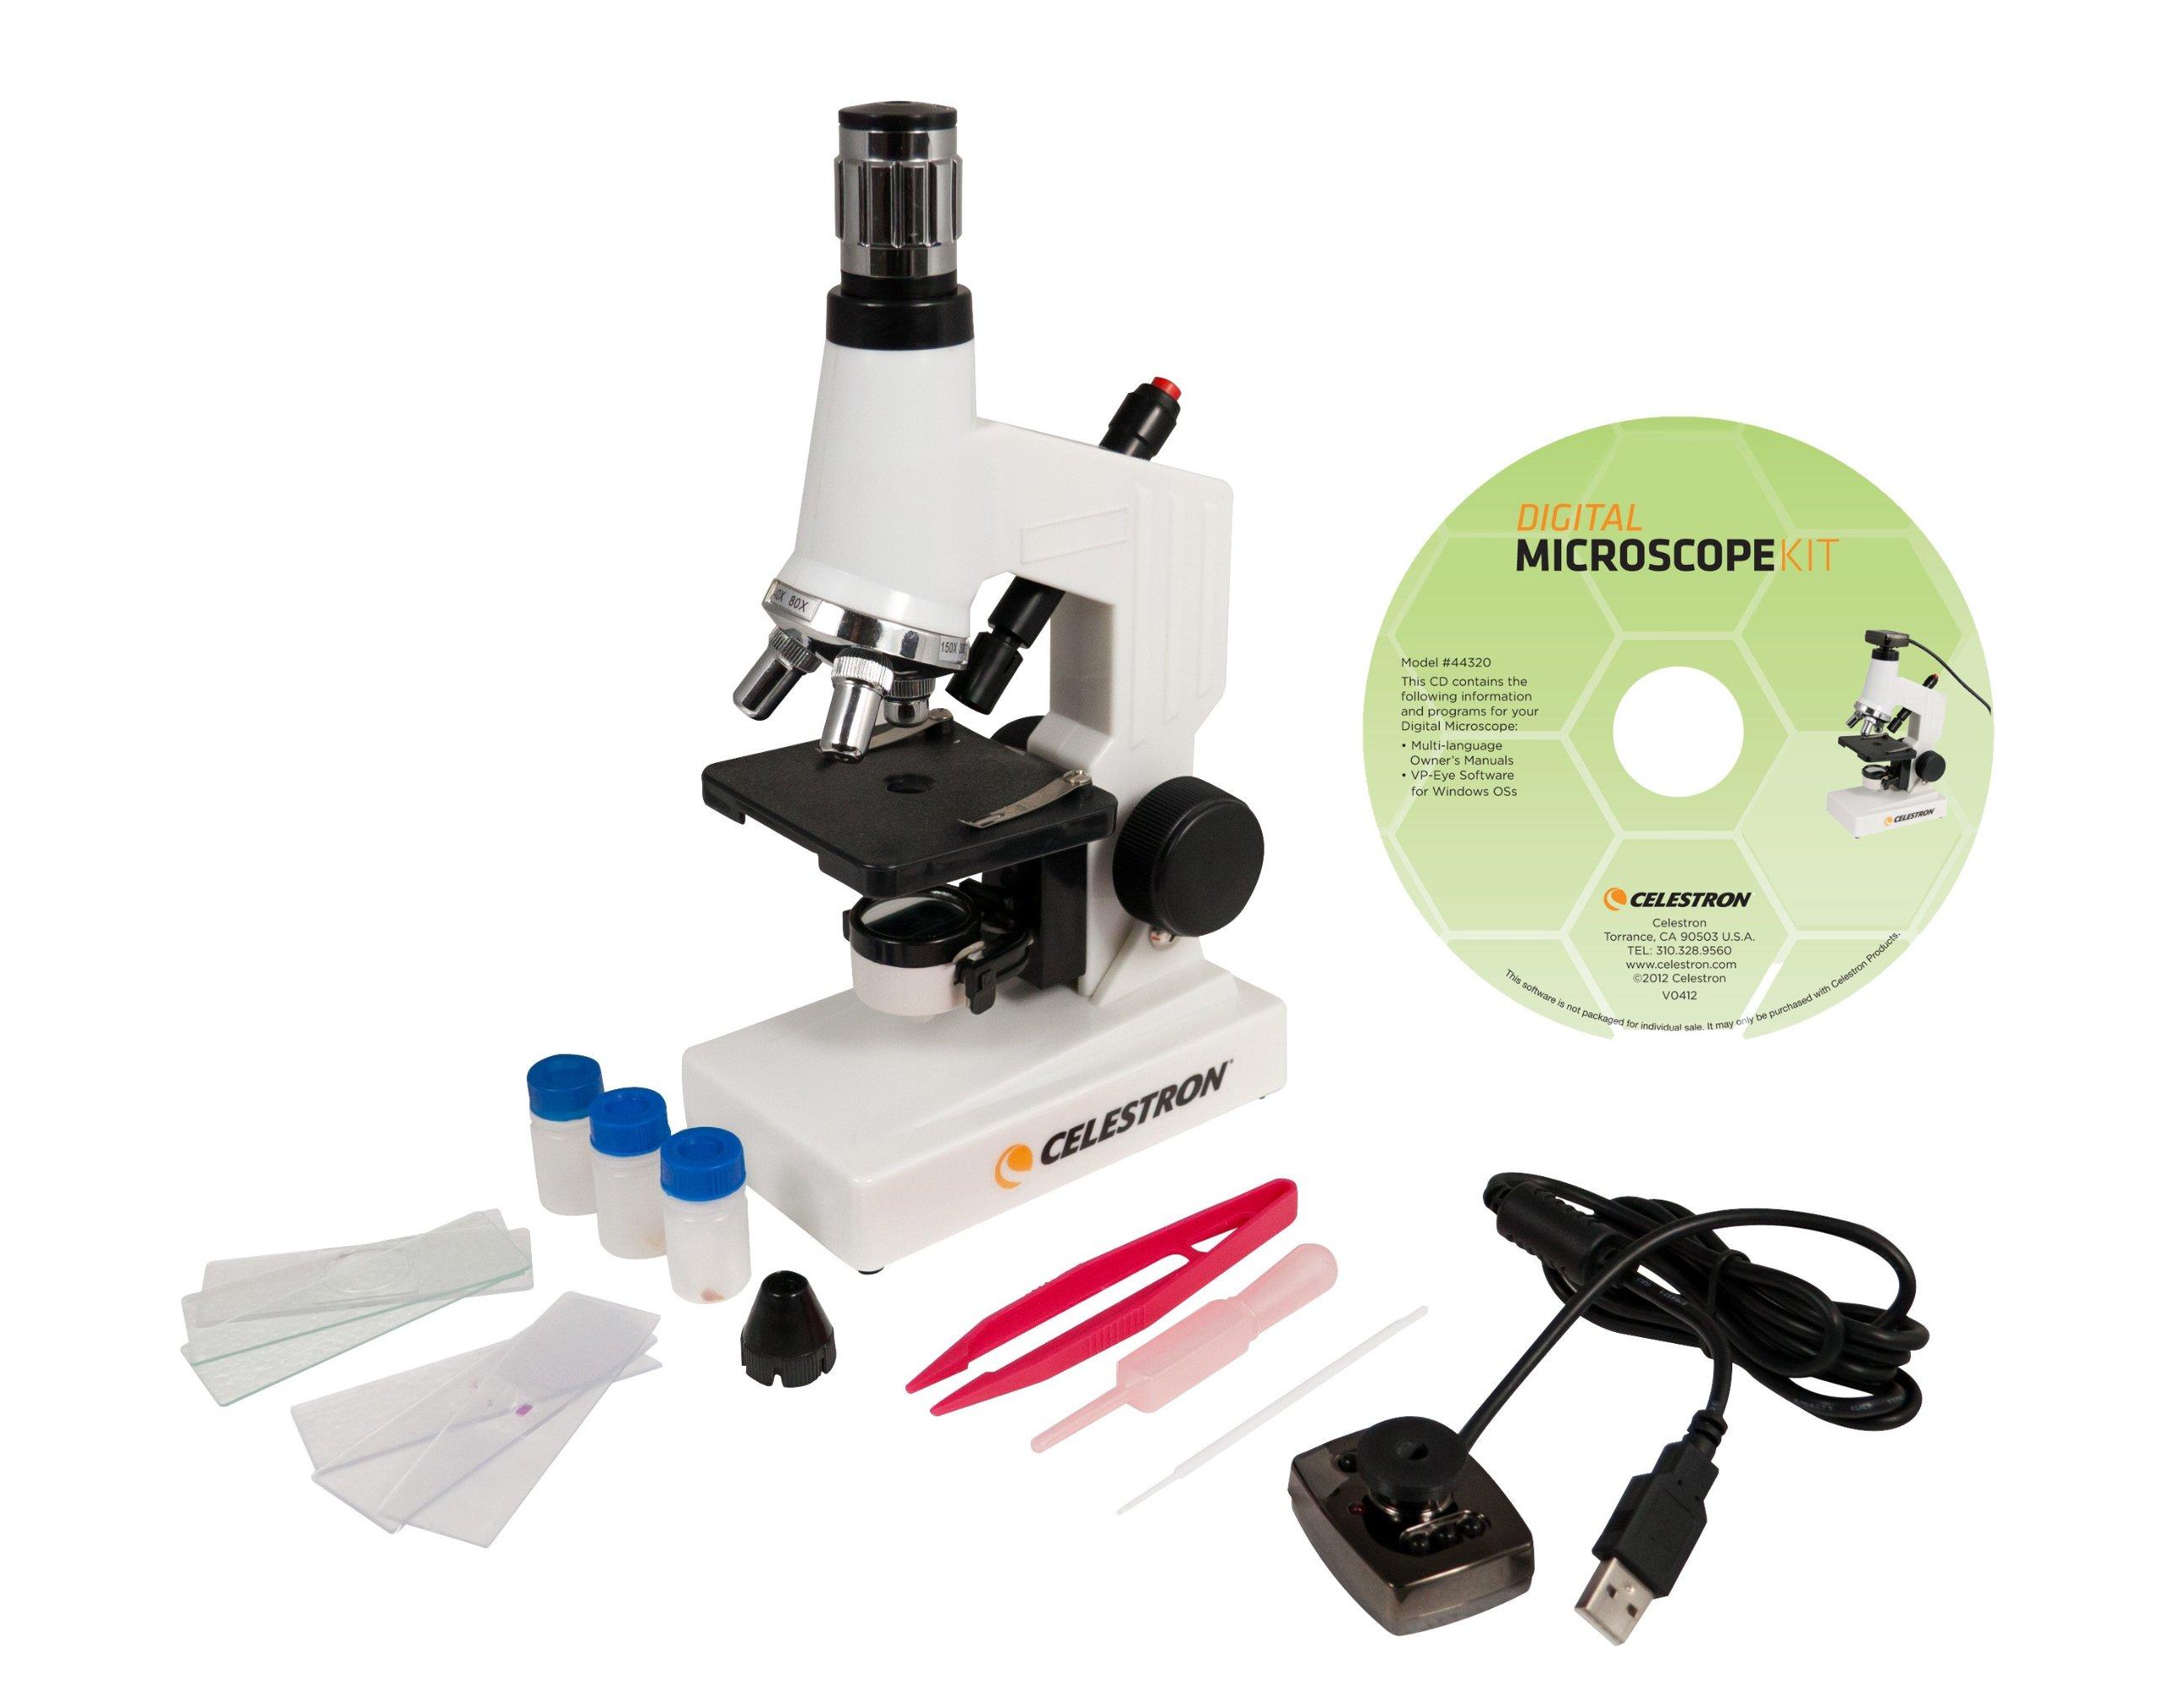 Celestron 44320 Microscope Digital Kit MDK by Celestron